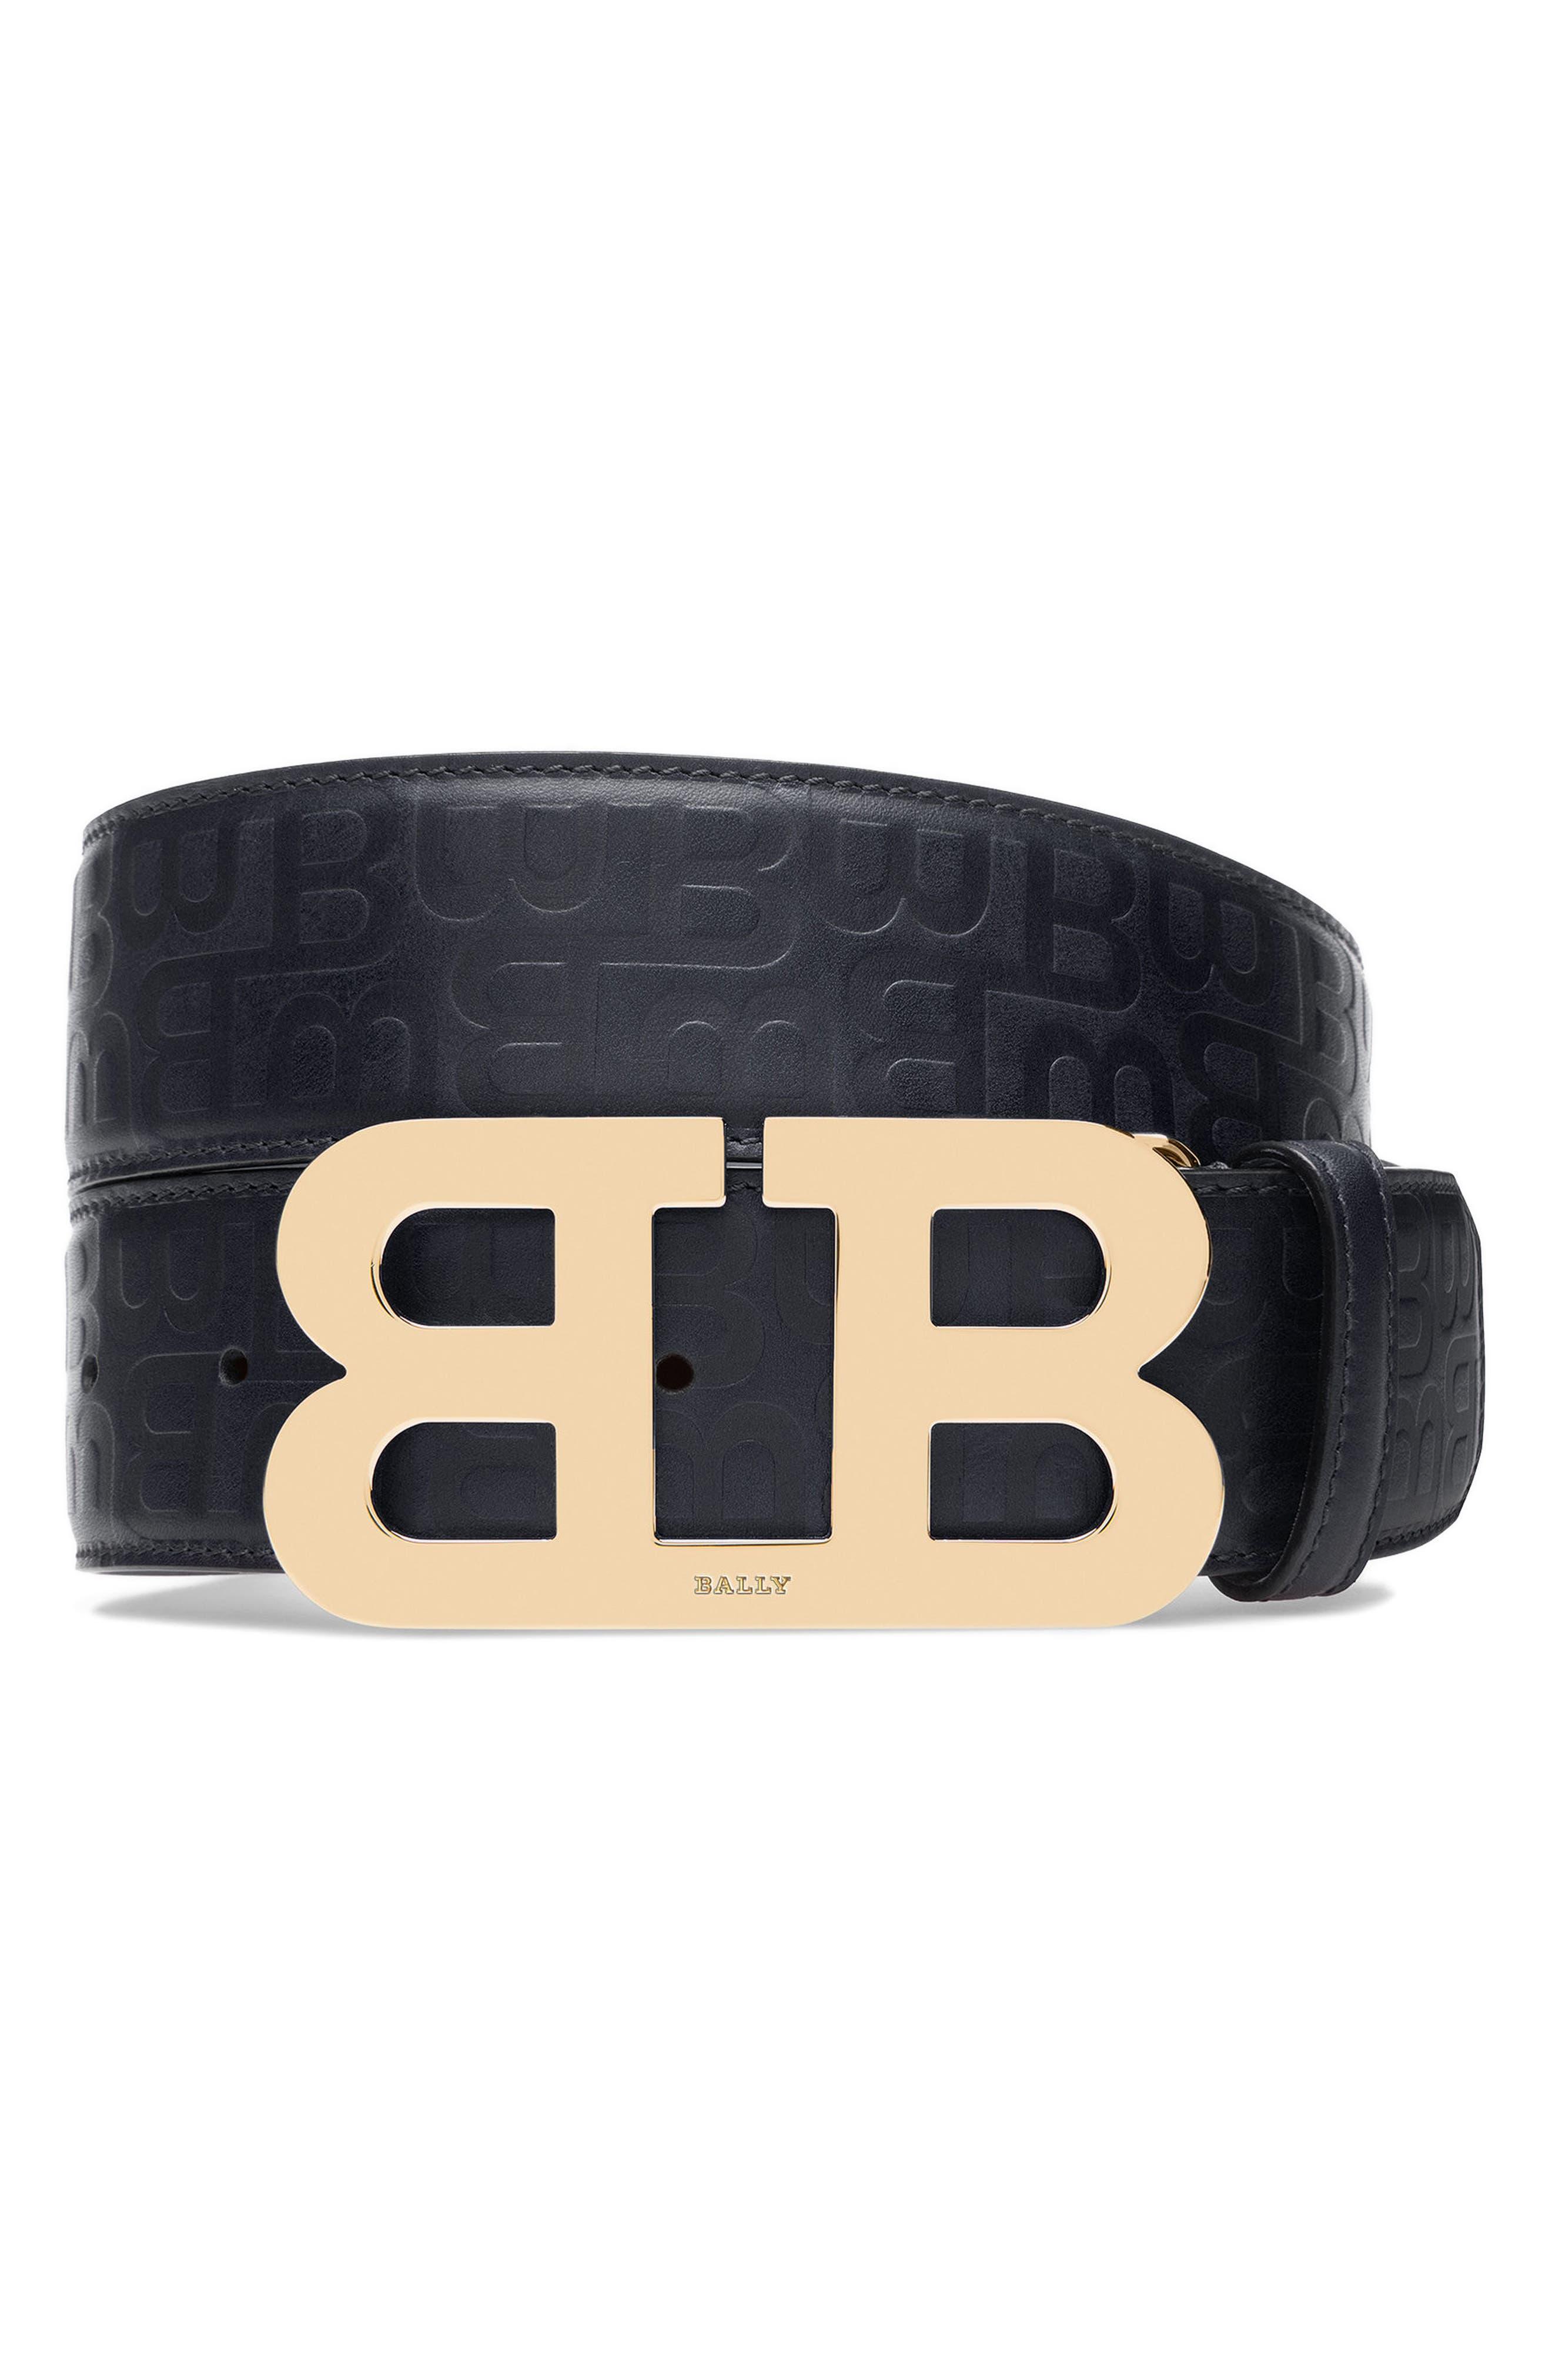 Main Image - Bally Stamped Logo Leather Belt